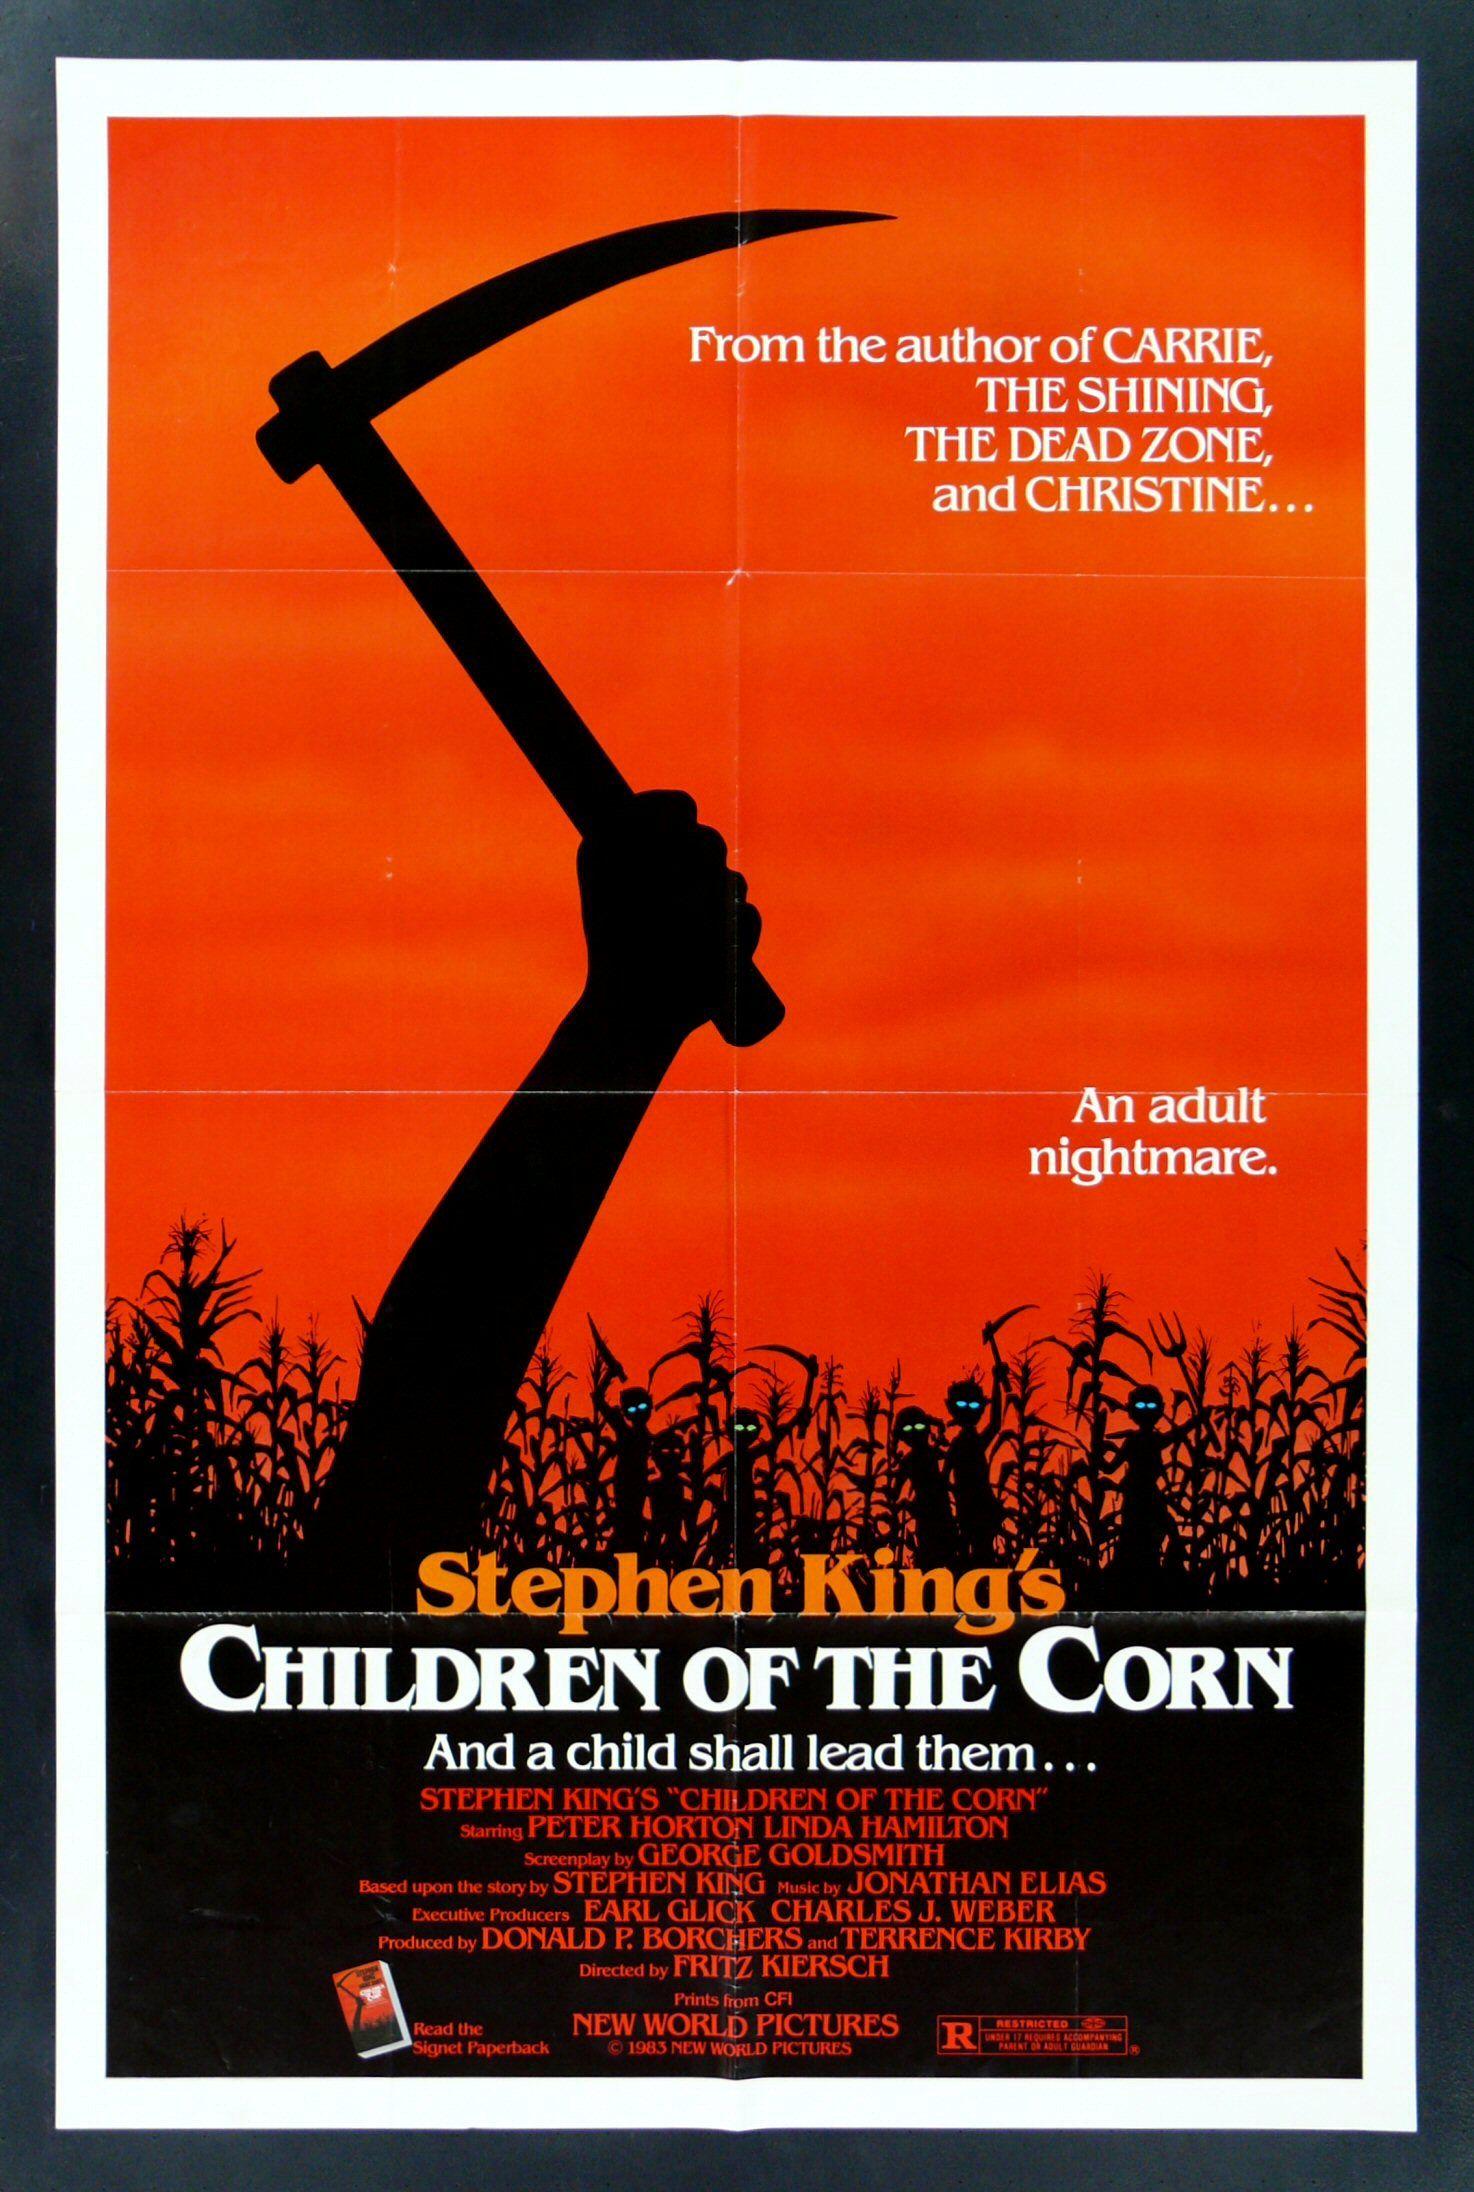 Childrenjan11 Jpg Jpeg Image 1474x2192 Pixels Scaled 32 Stephen King Movies Best Horror Movies Horror Movie Posters